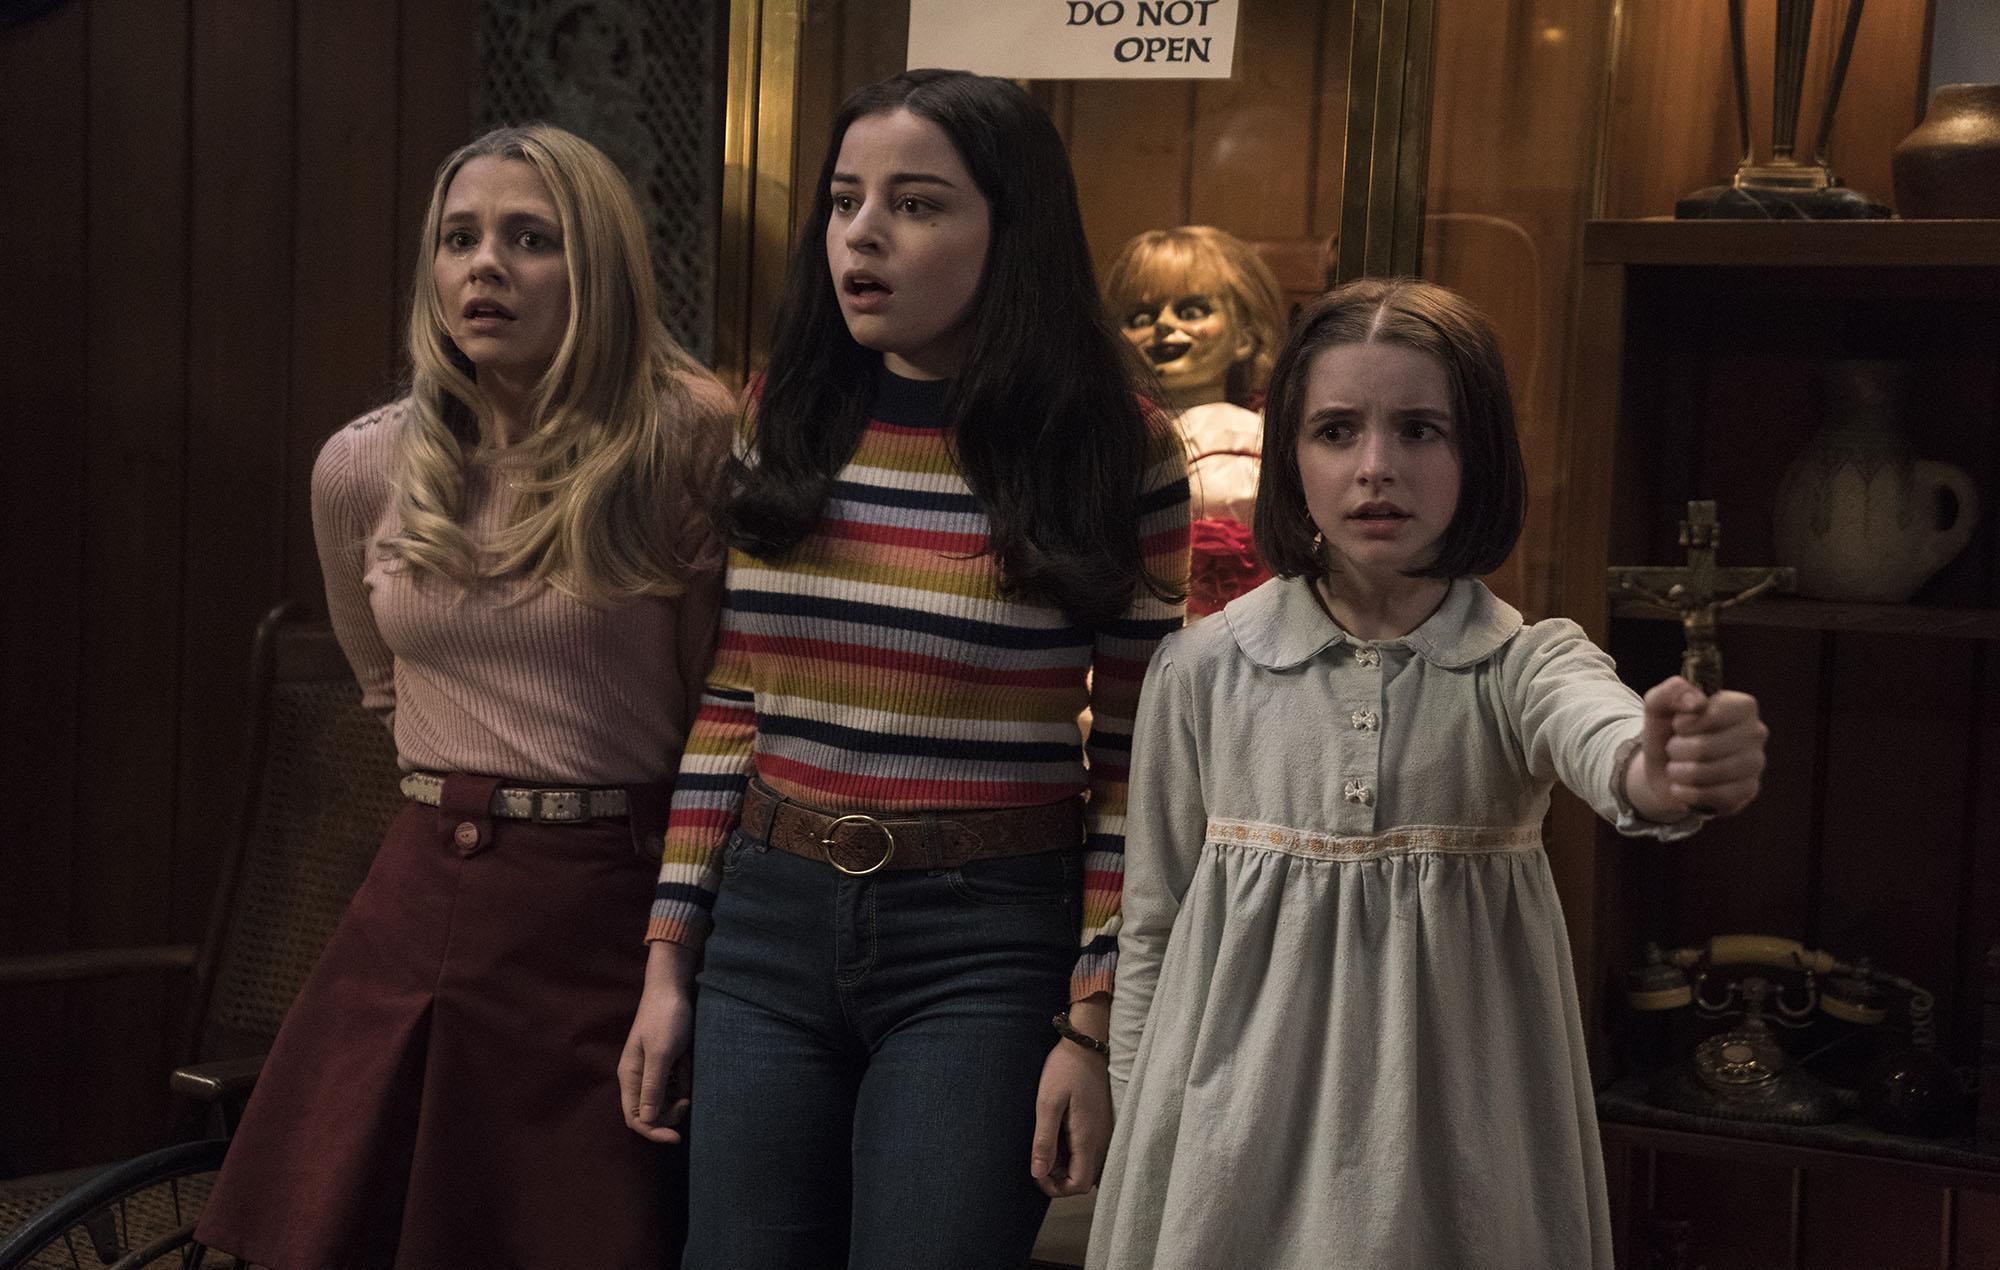 (l to r) Babysitter Madison Iseman, friend Katie Sarife and Judy Warren (McKenna Grace) in Annabelle Comes Home (2019)